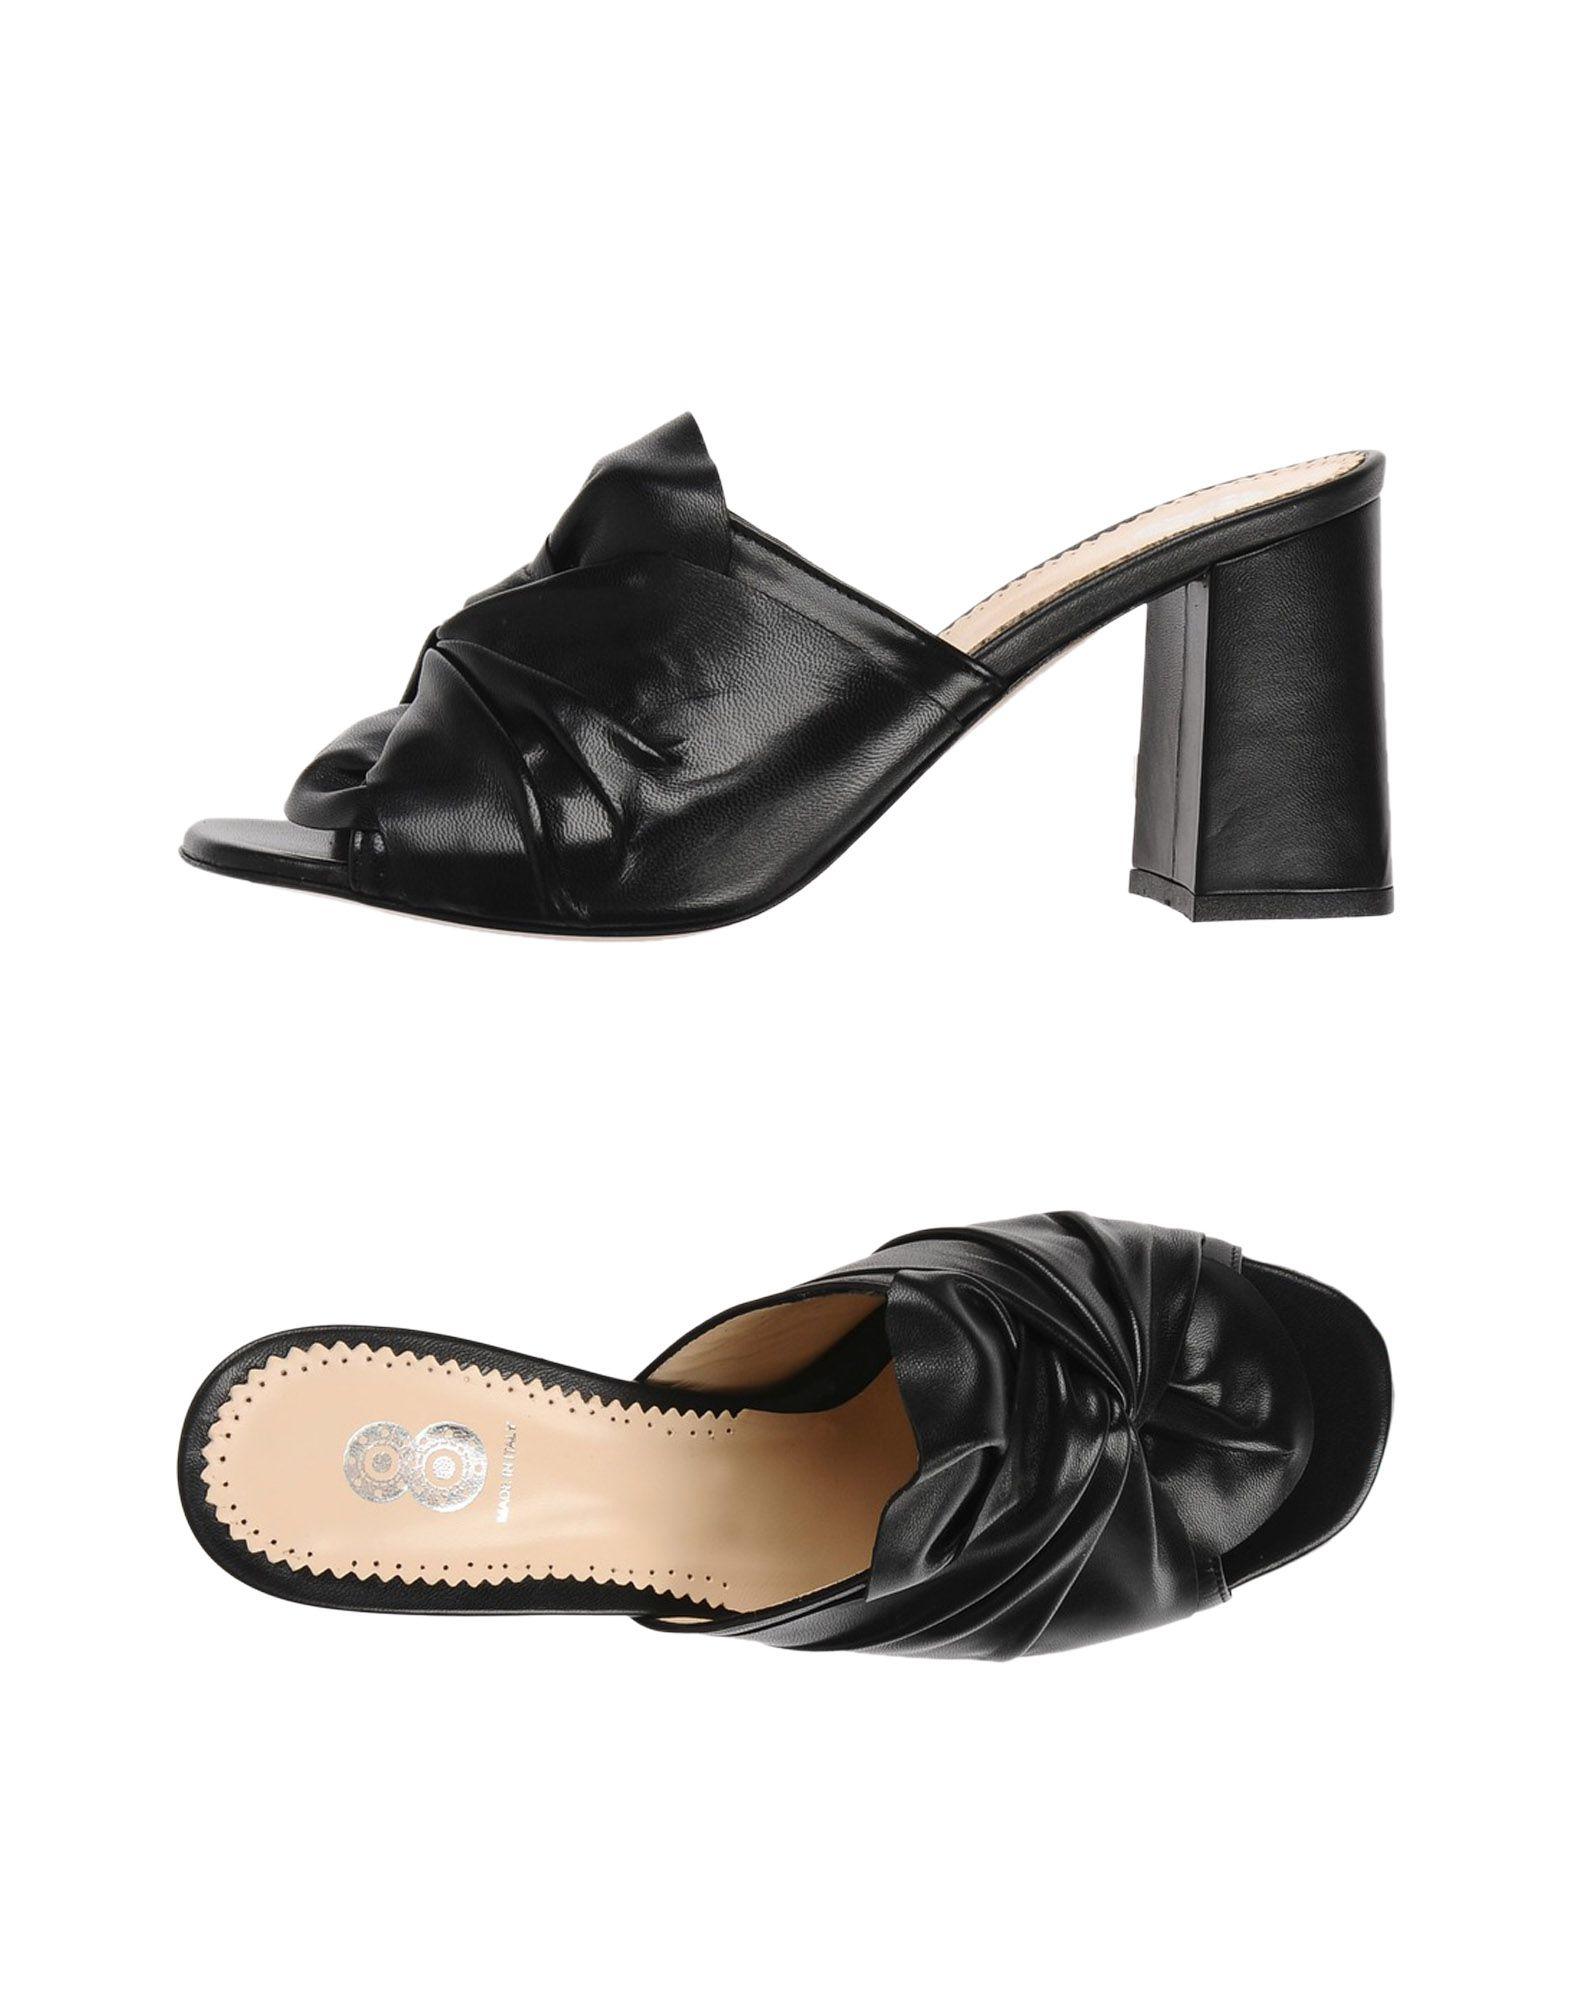 Moda Sandali 8 Donna - 11452750JC